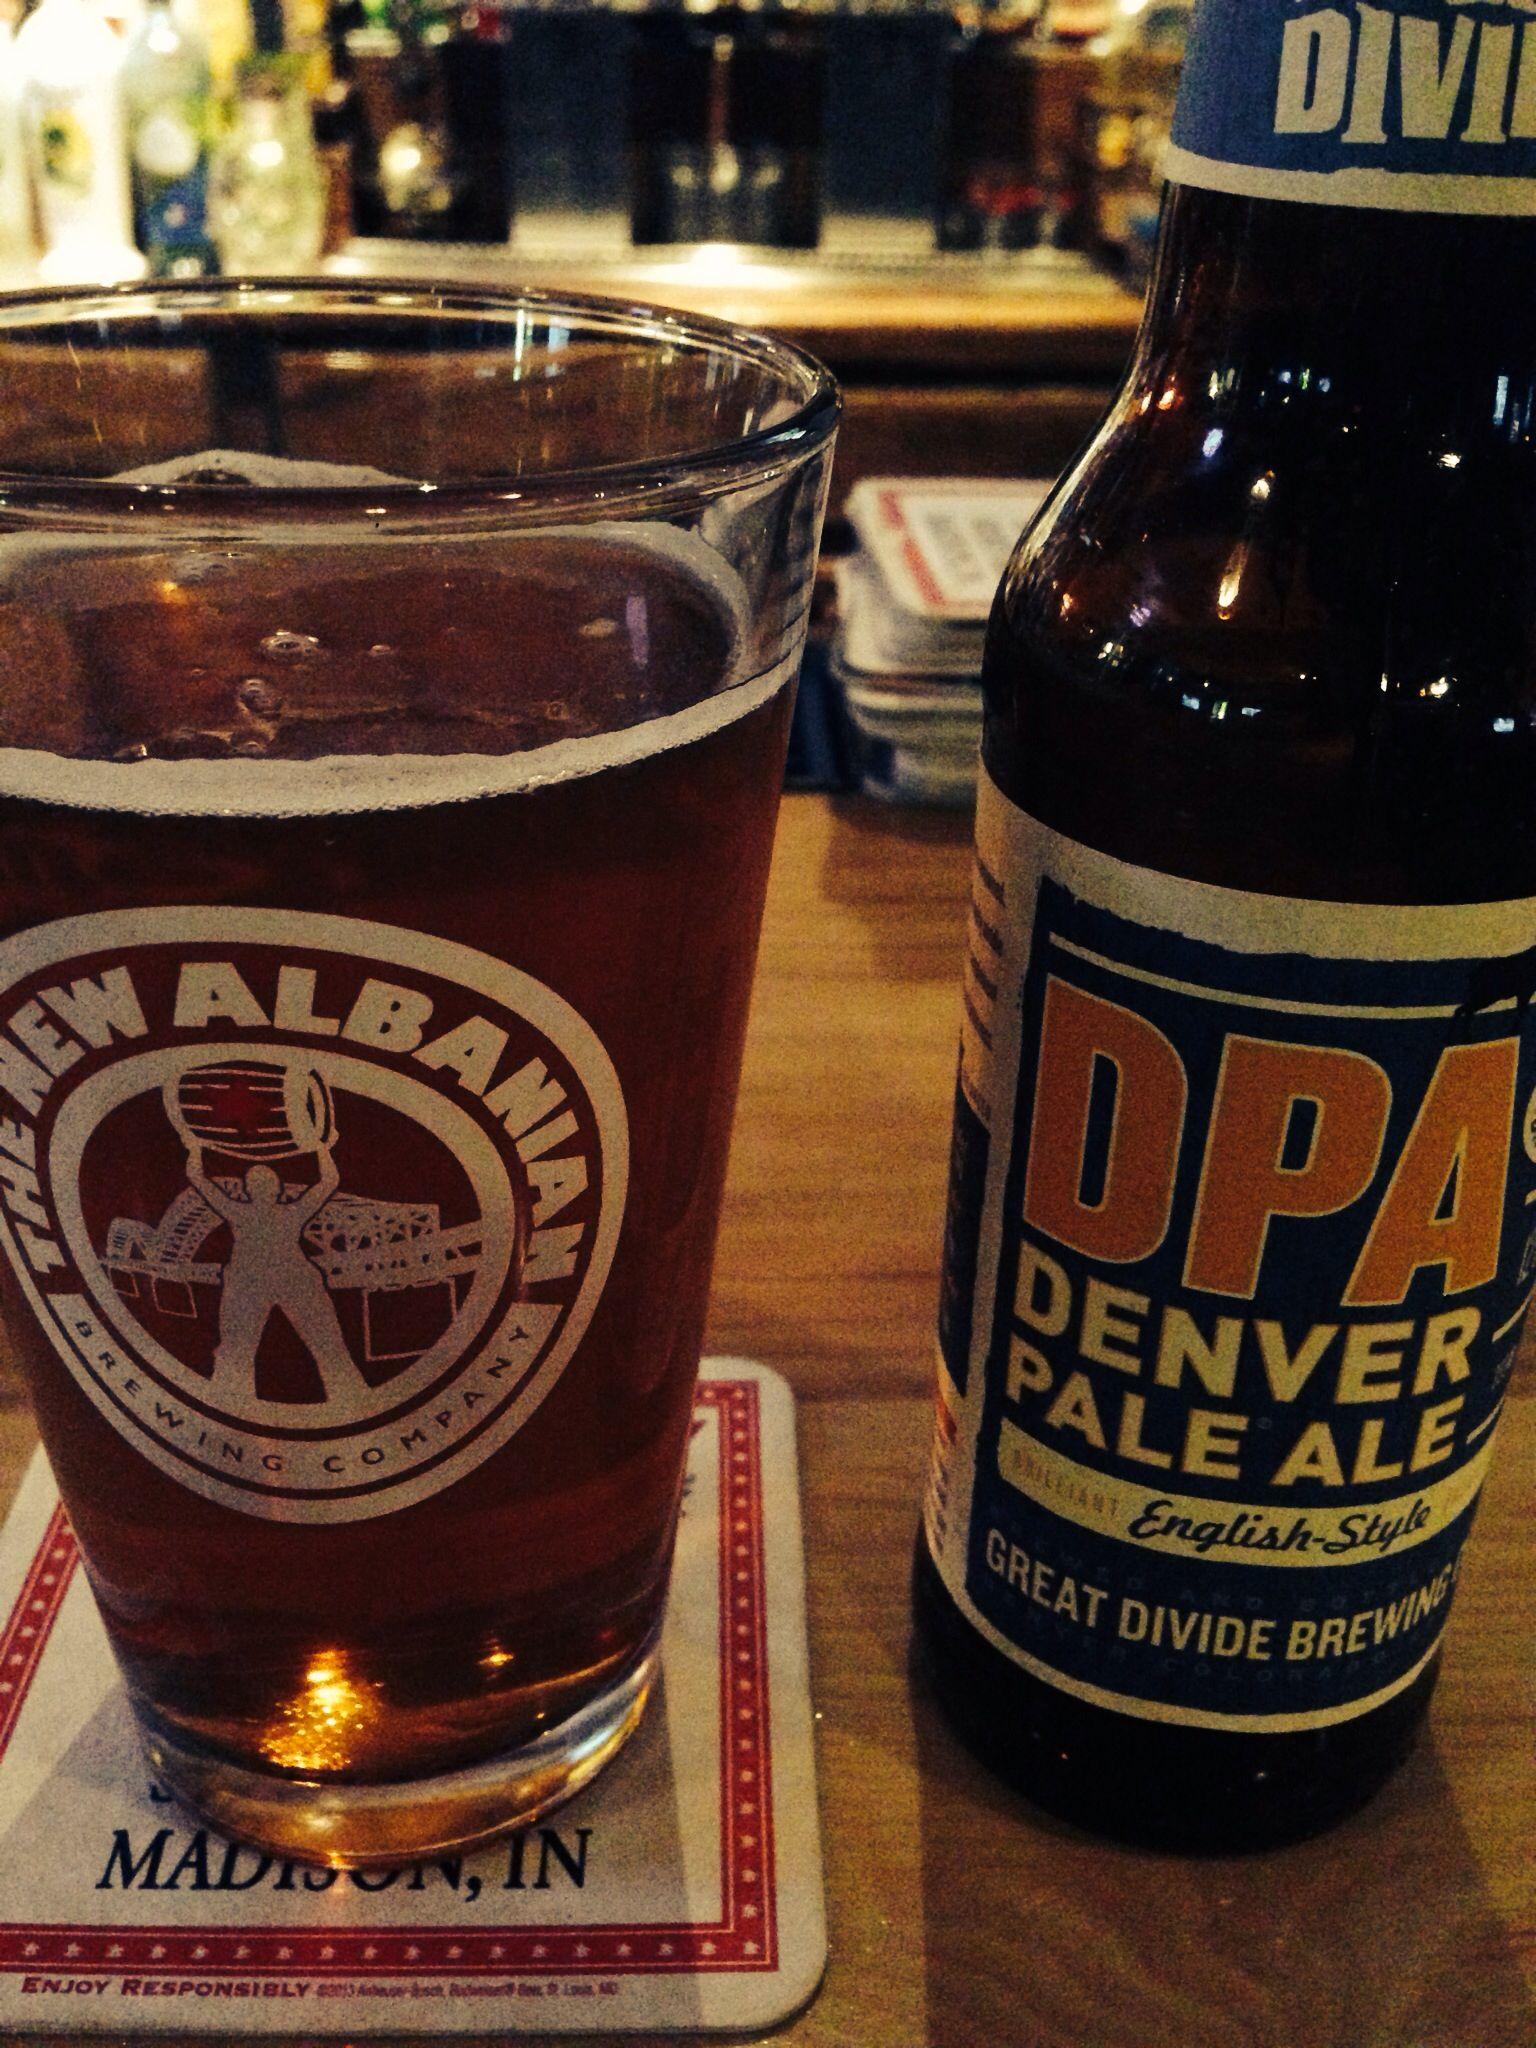 Great divide denver pale ale pale ale ale beer bottle